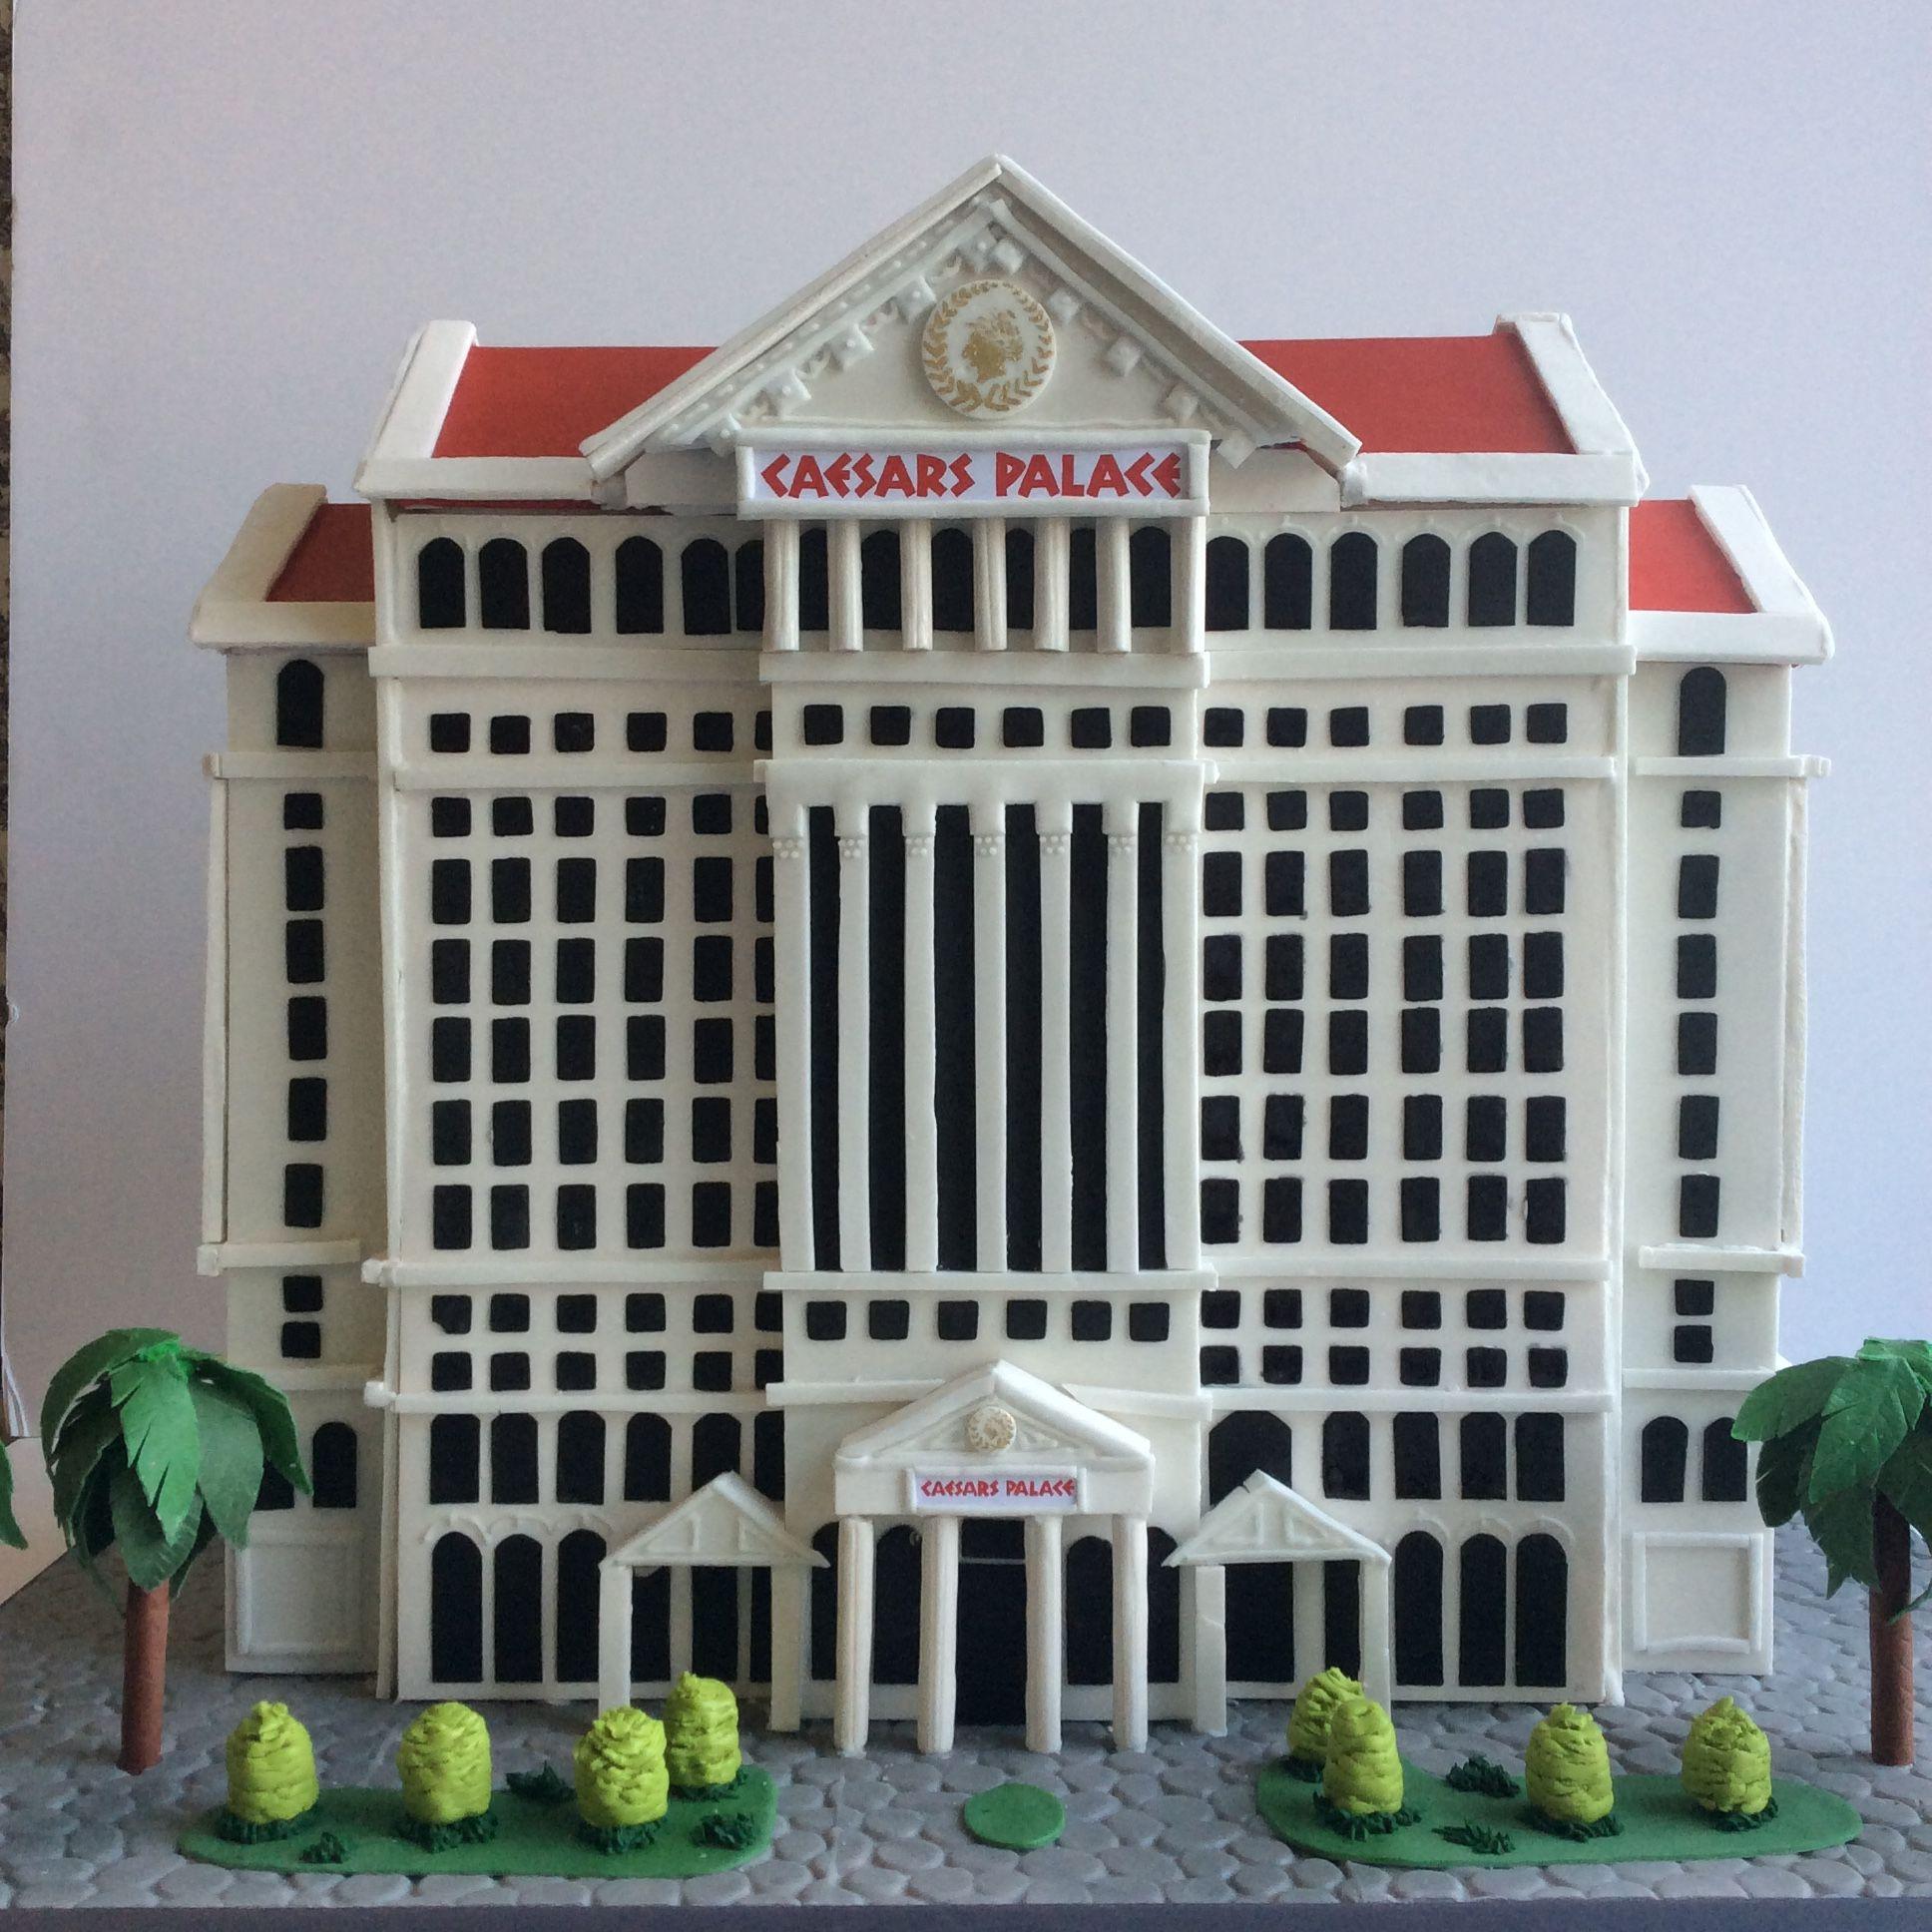 Caesars Palace Wedding Cake Amy Beck Cake Design Chicago Il Www